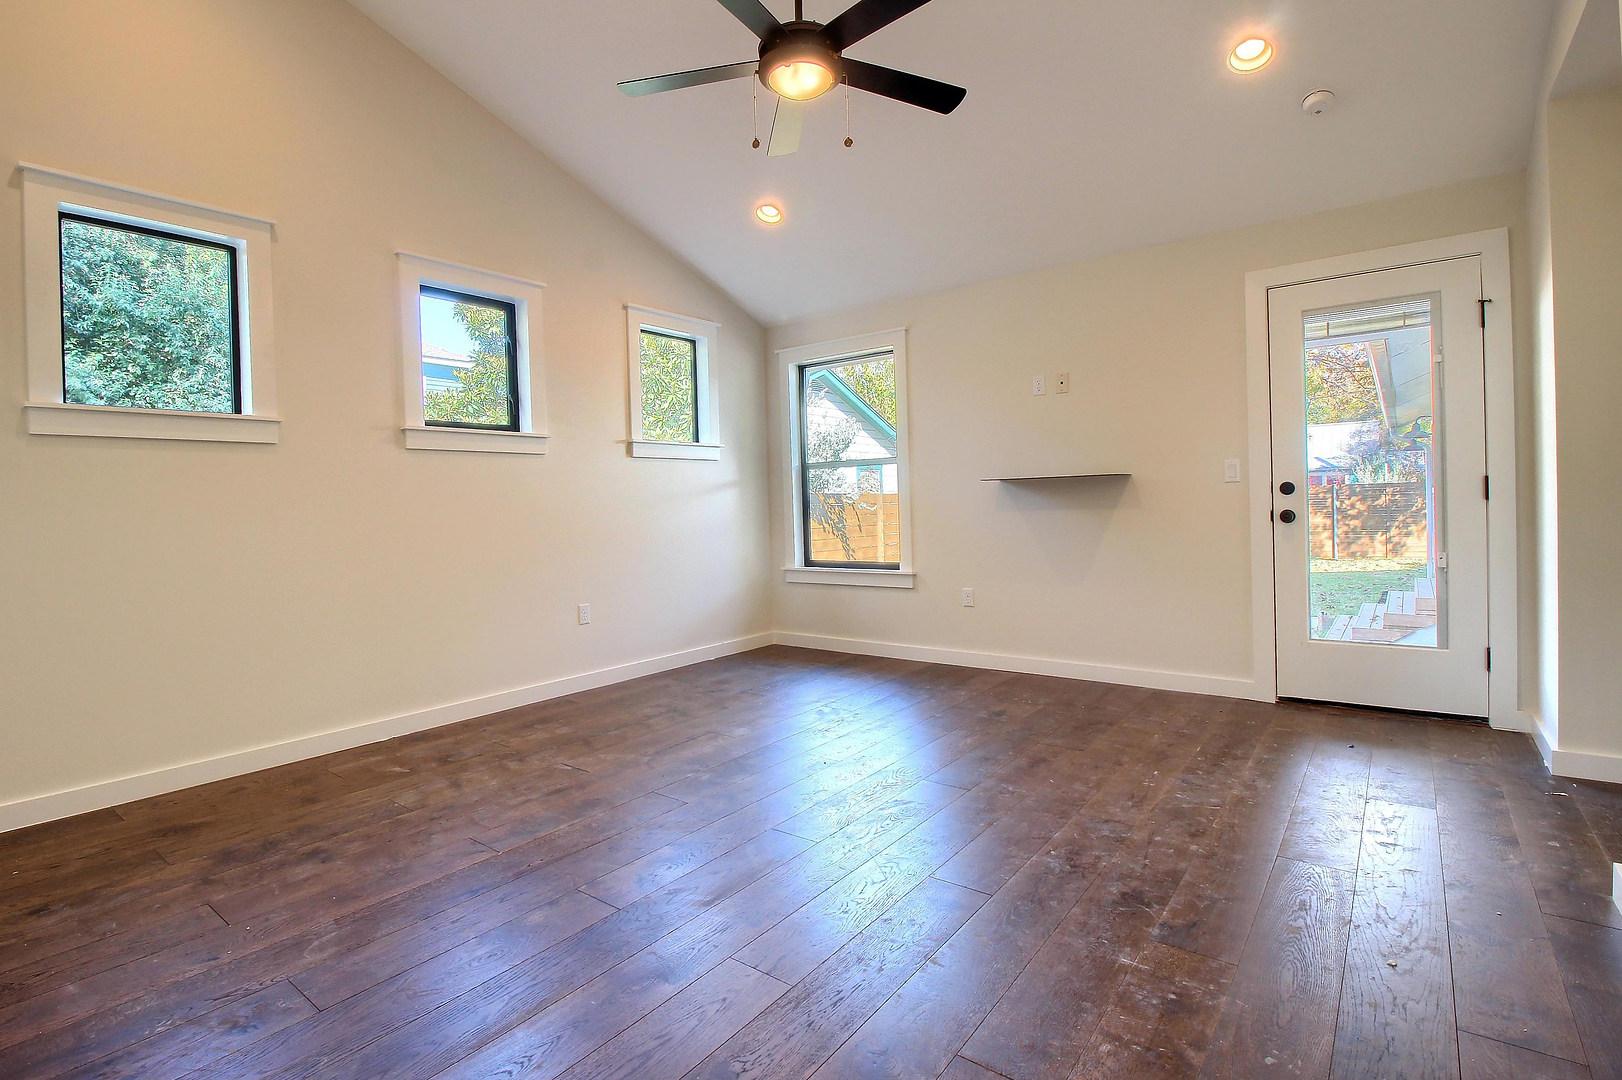 Home Renovation Master Bedroom Windows on Bouldin in Austin, TX